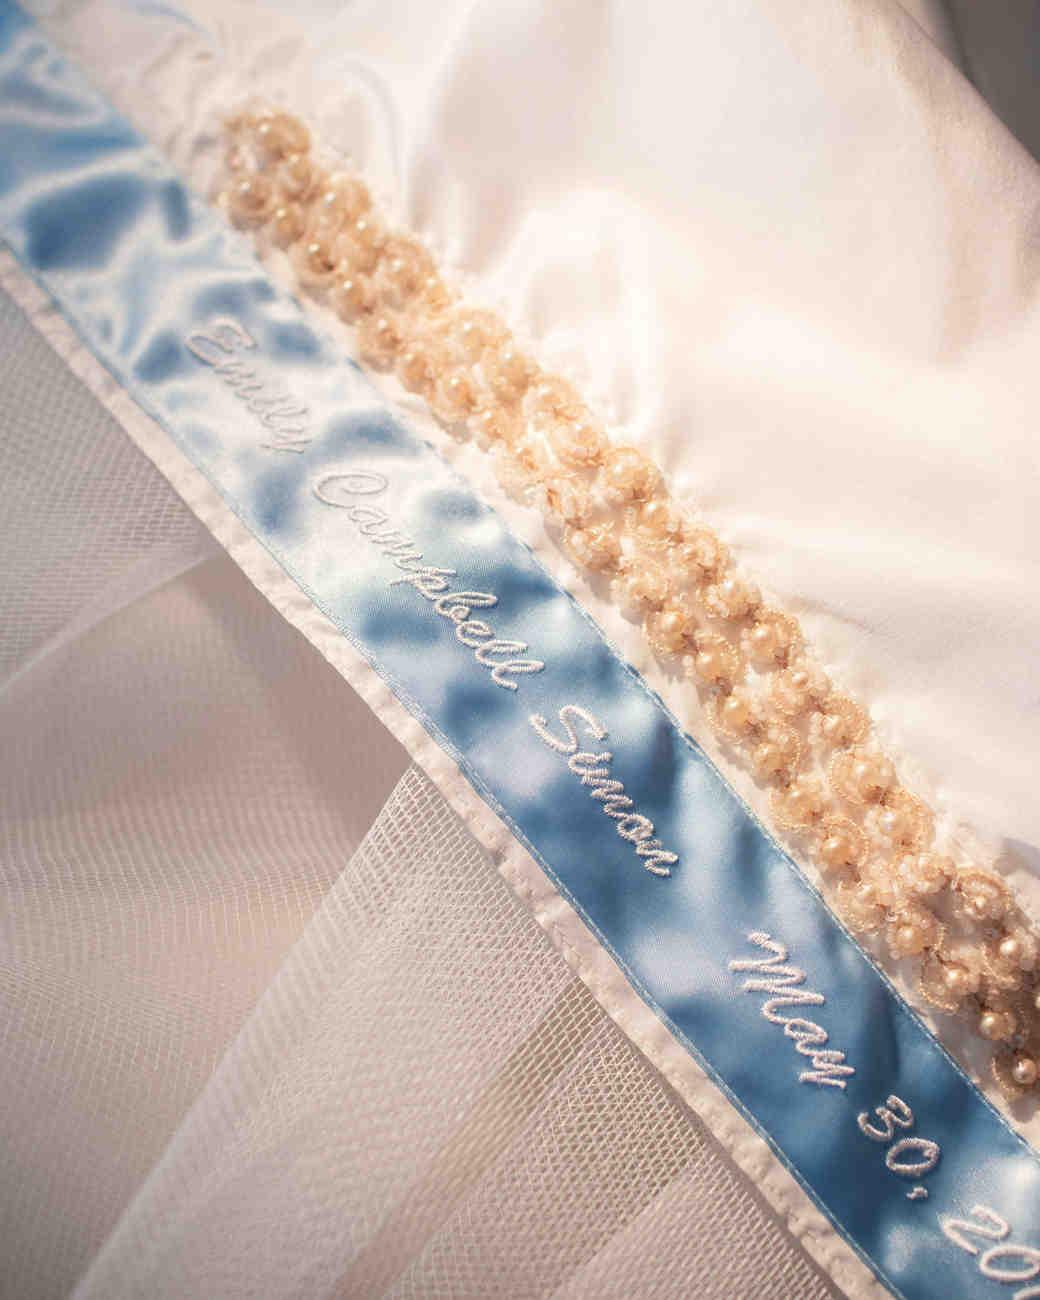 emily-matthew-wedding-embroidery-0241-s112720-0316.jpg